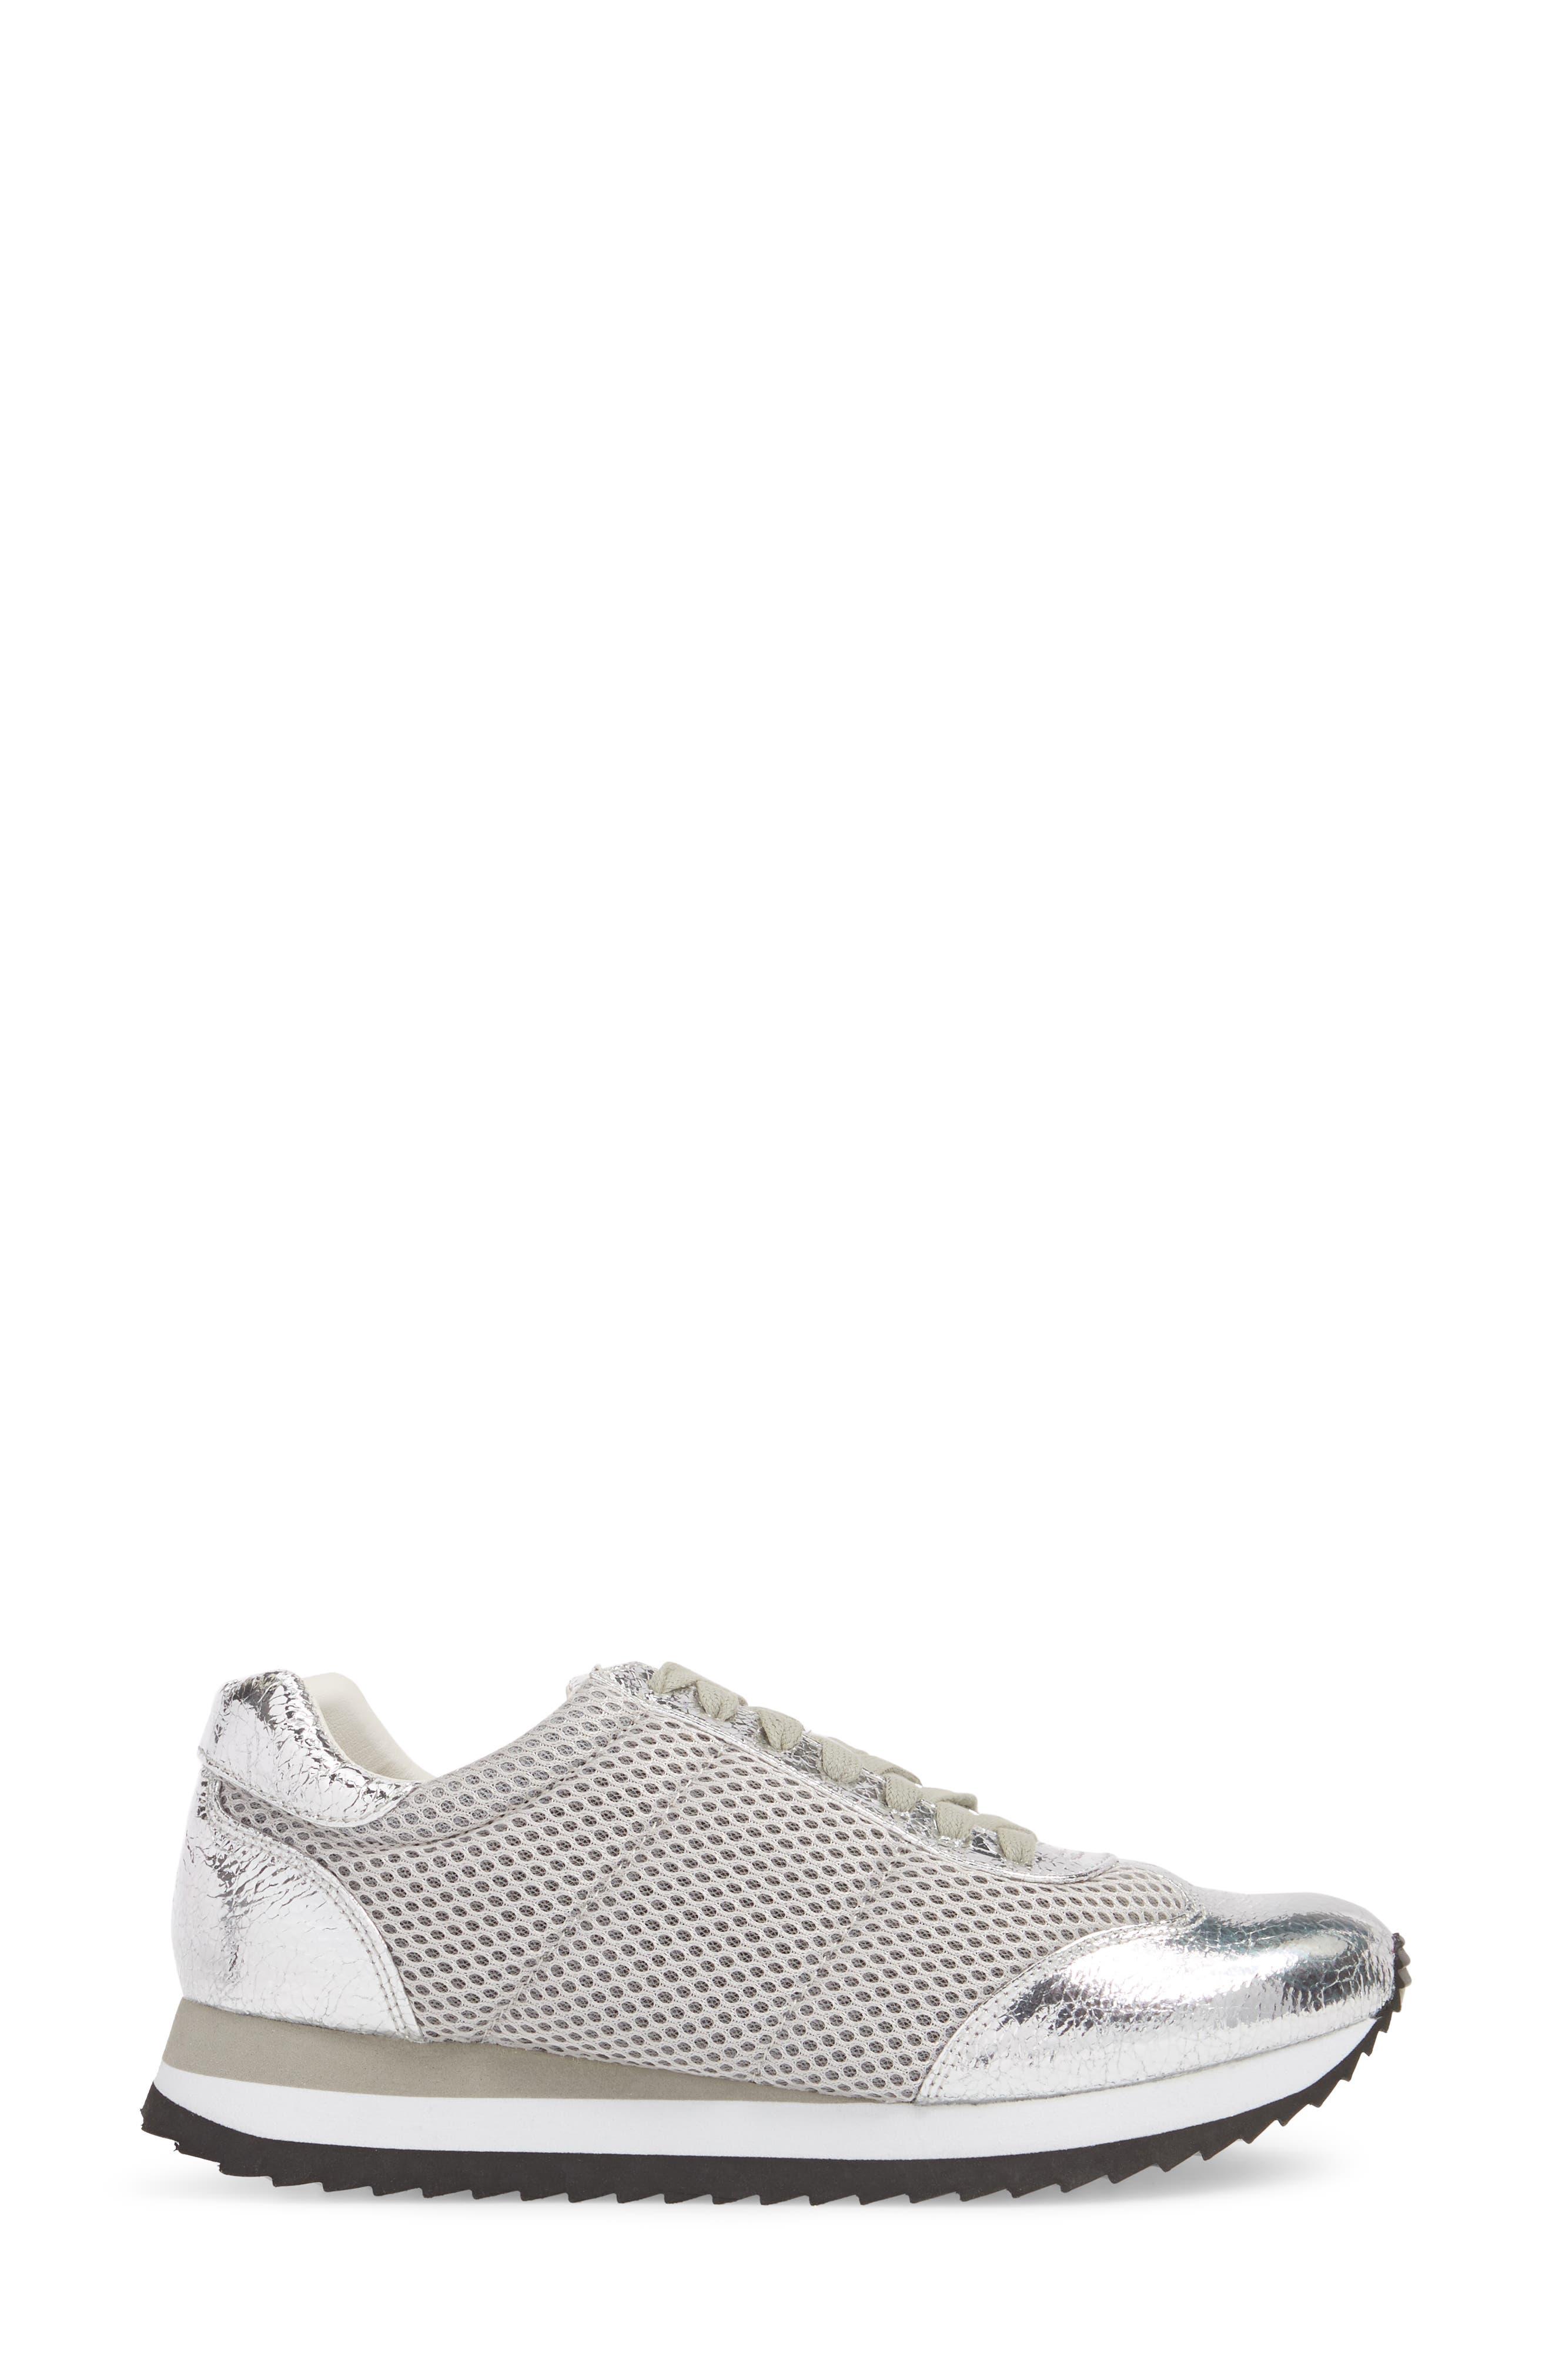 Jaclyn Mesh Sneaker,                             Alternate thumbnail 3, color,                             Silver